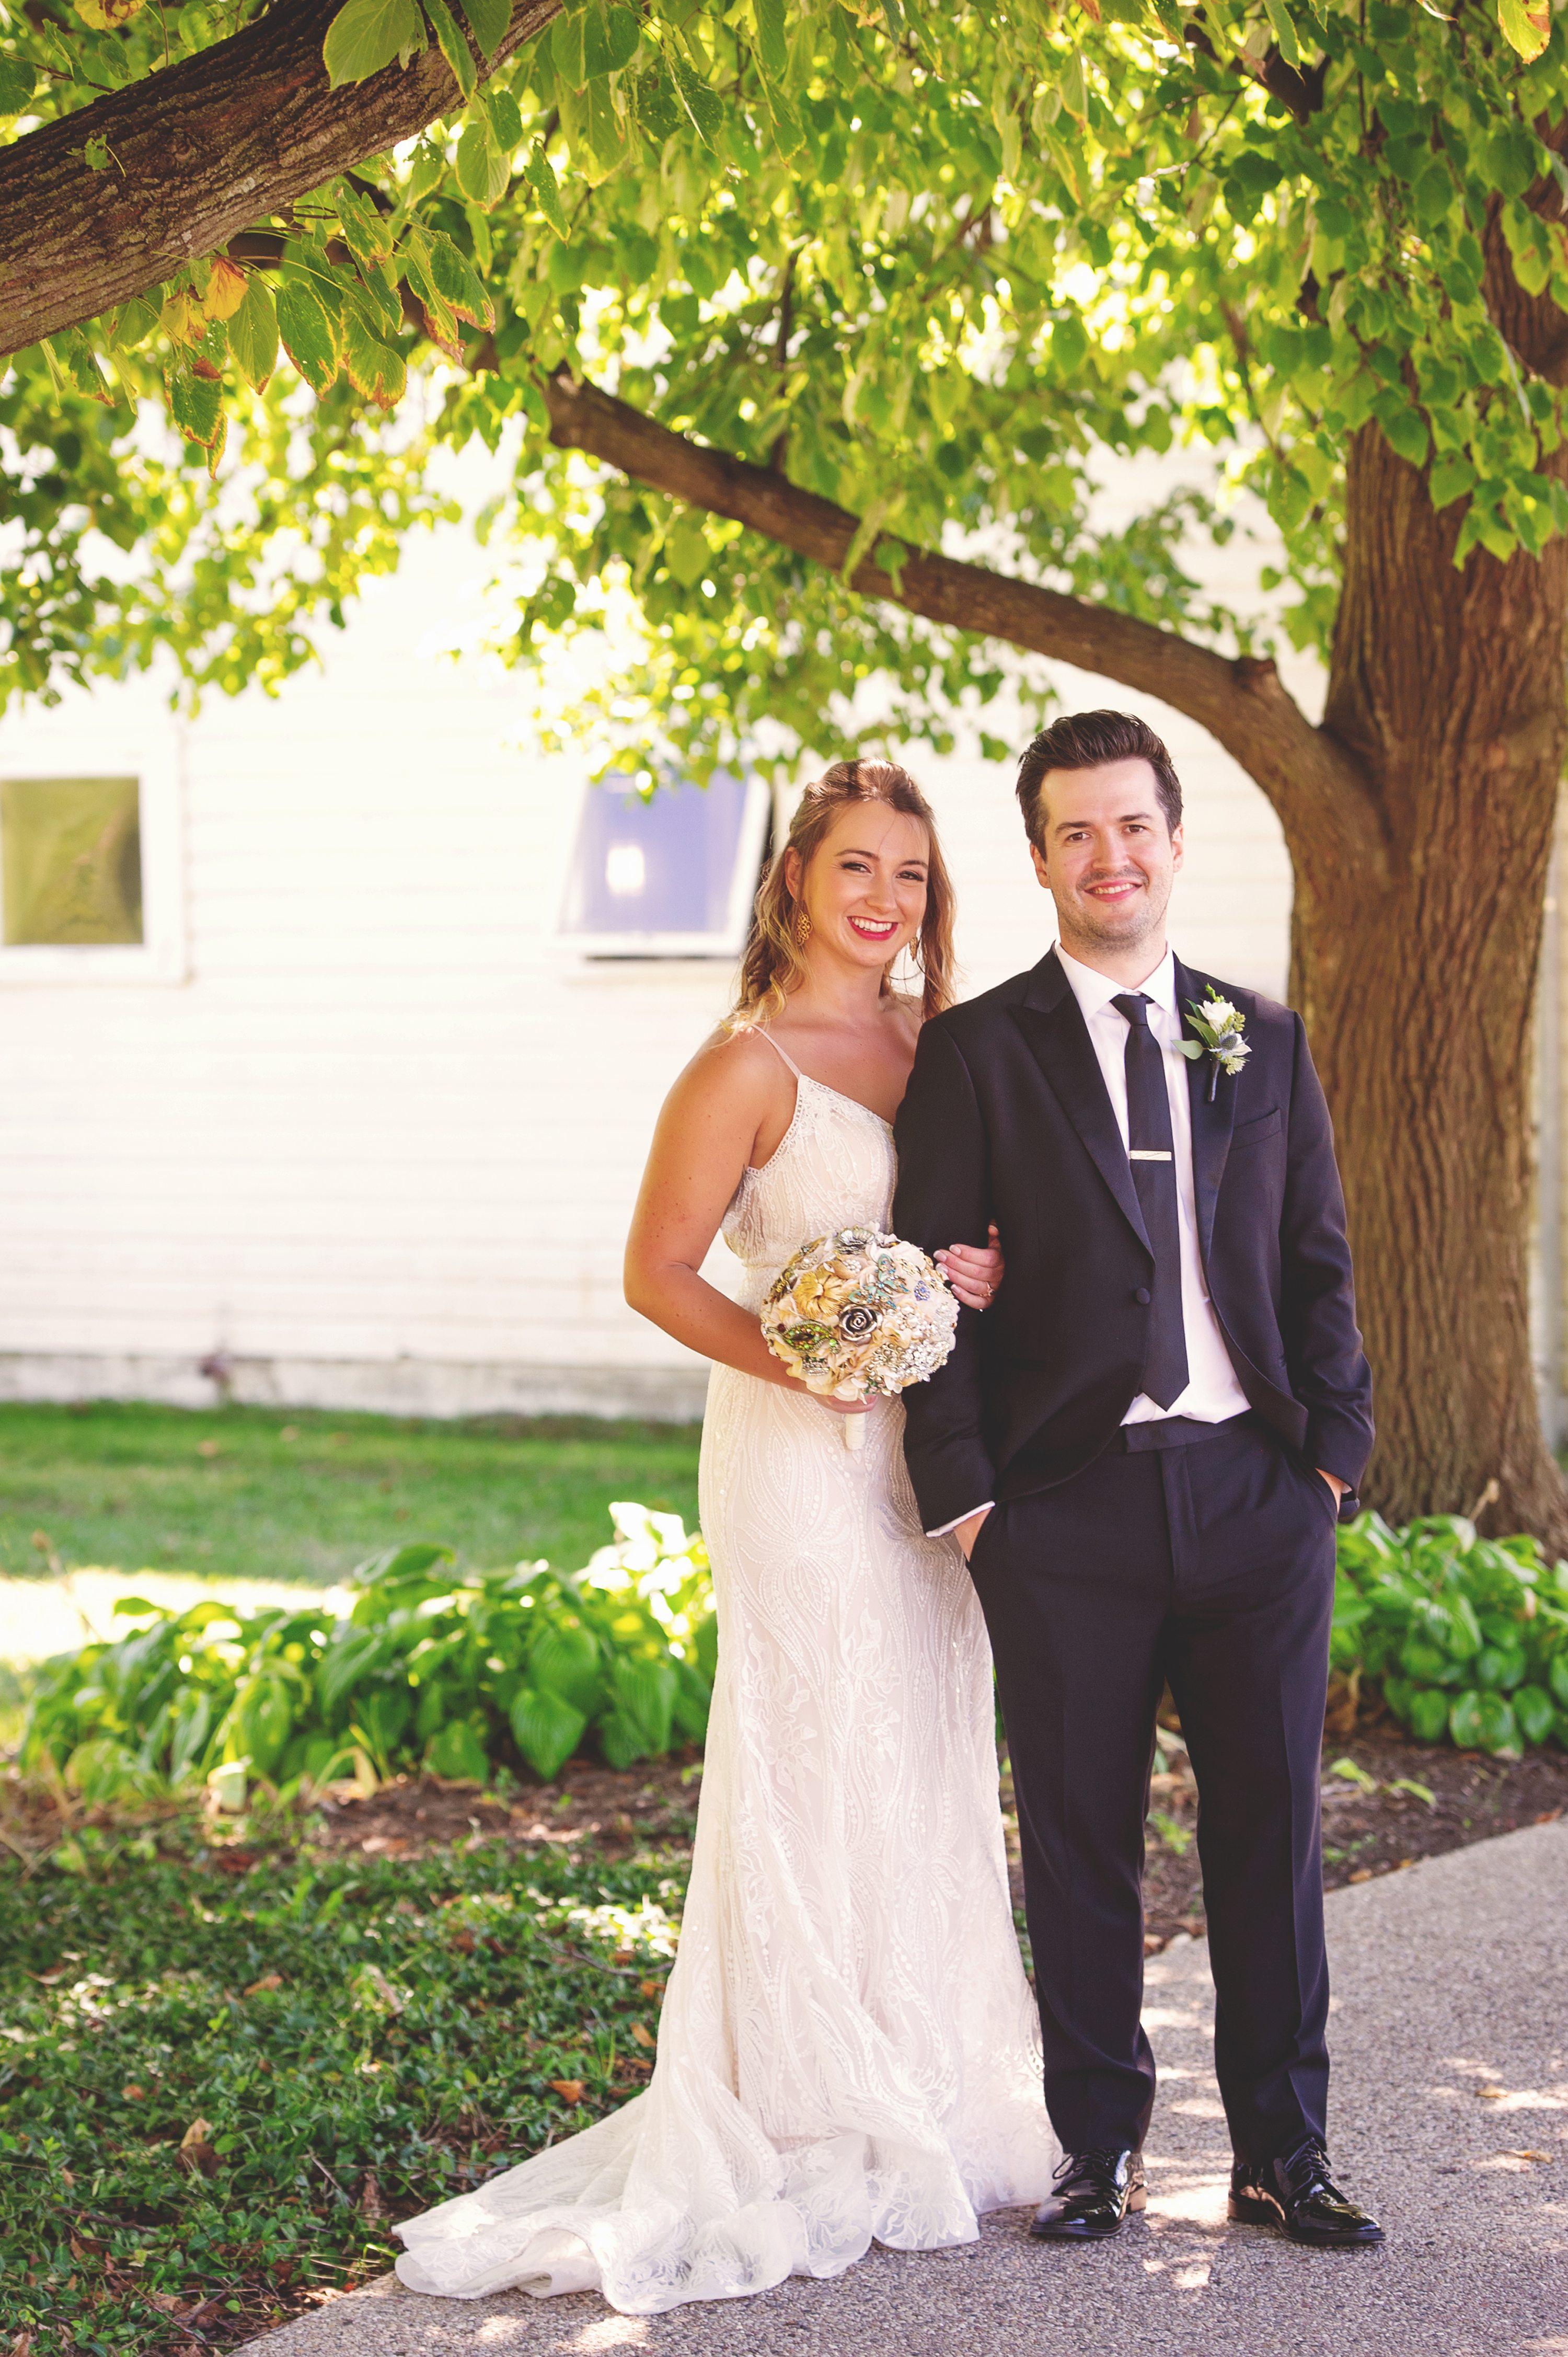 Wheaton wedding photographer,wedding pictures at Danada house